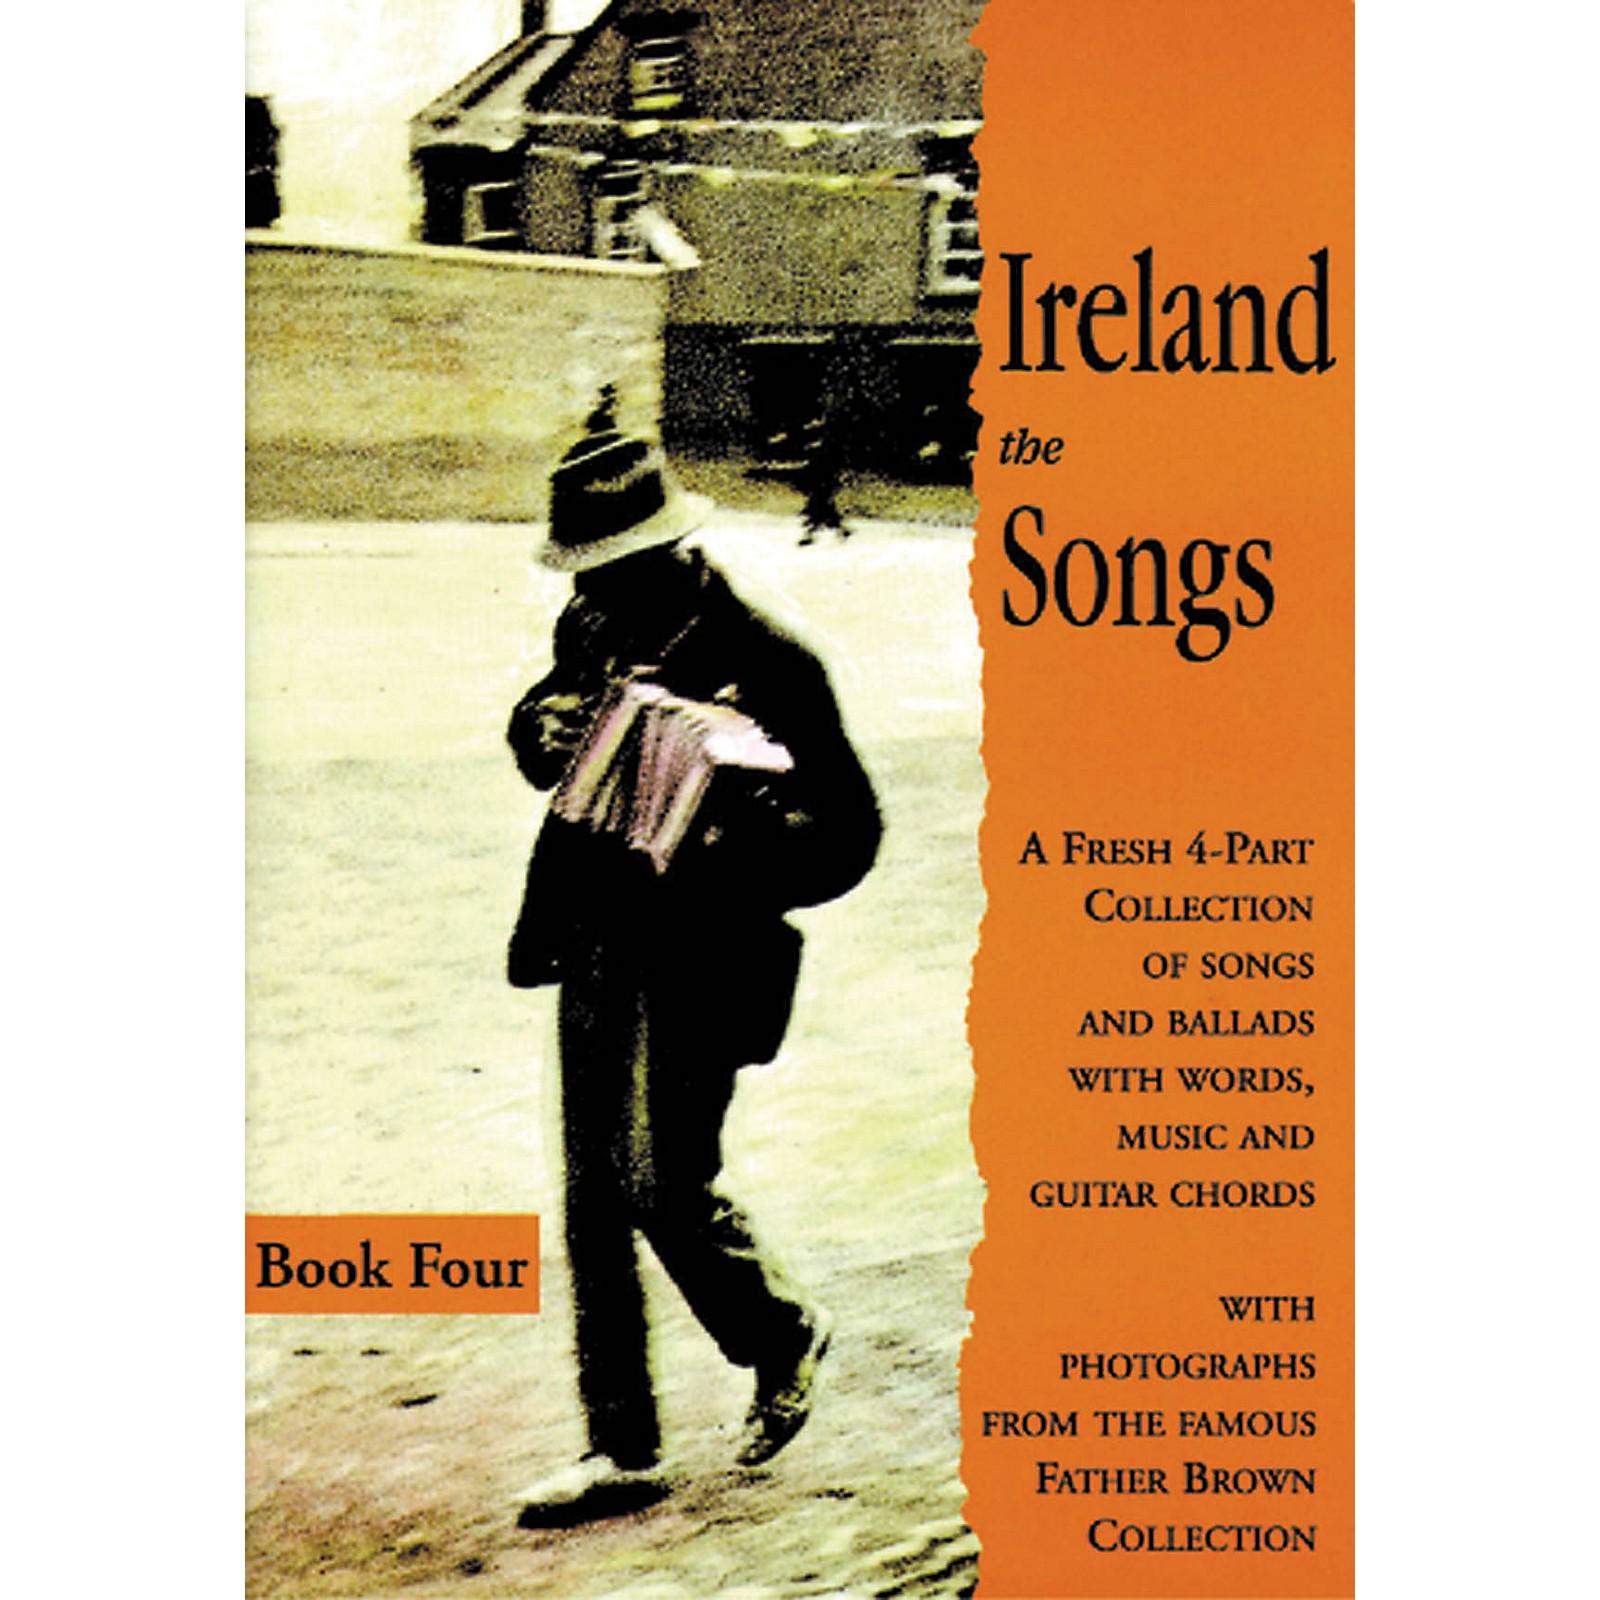 Waltons Ireland: The Songs - Book Four Waltons Irish Music Books Series Softcover